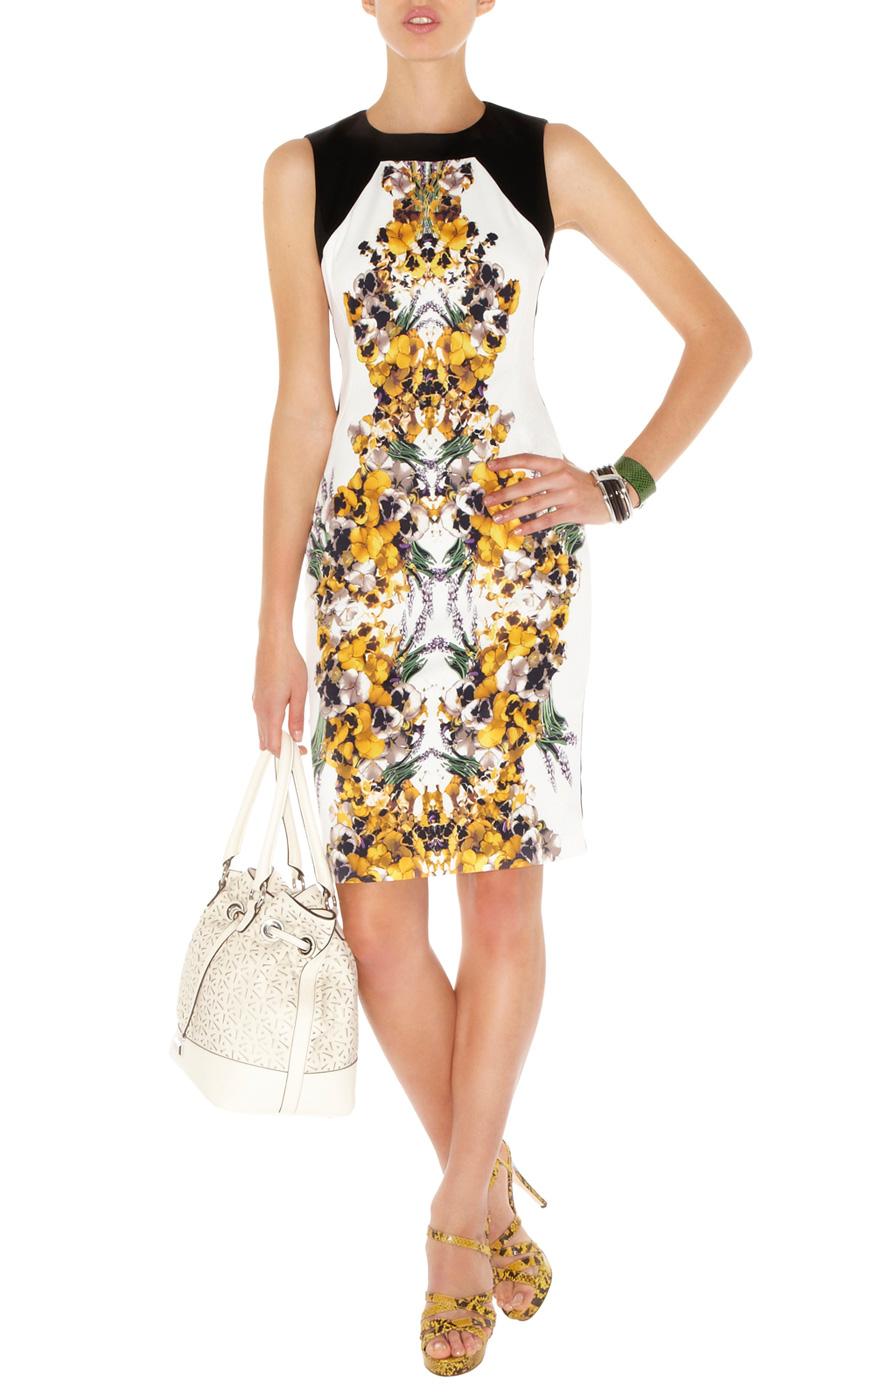 Karen Millen Colourful Painted Floral Cotton Dress In